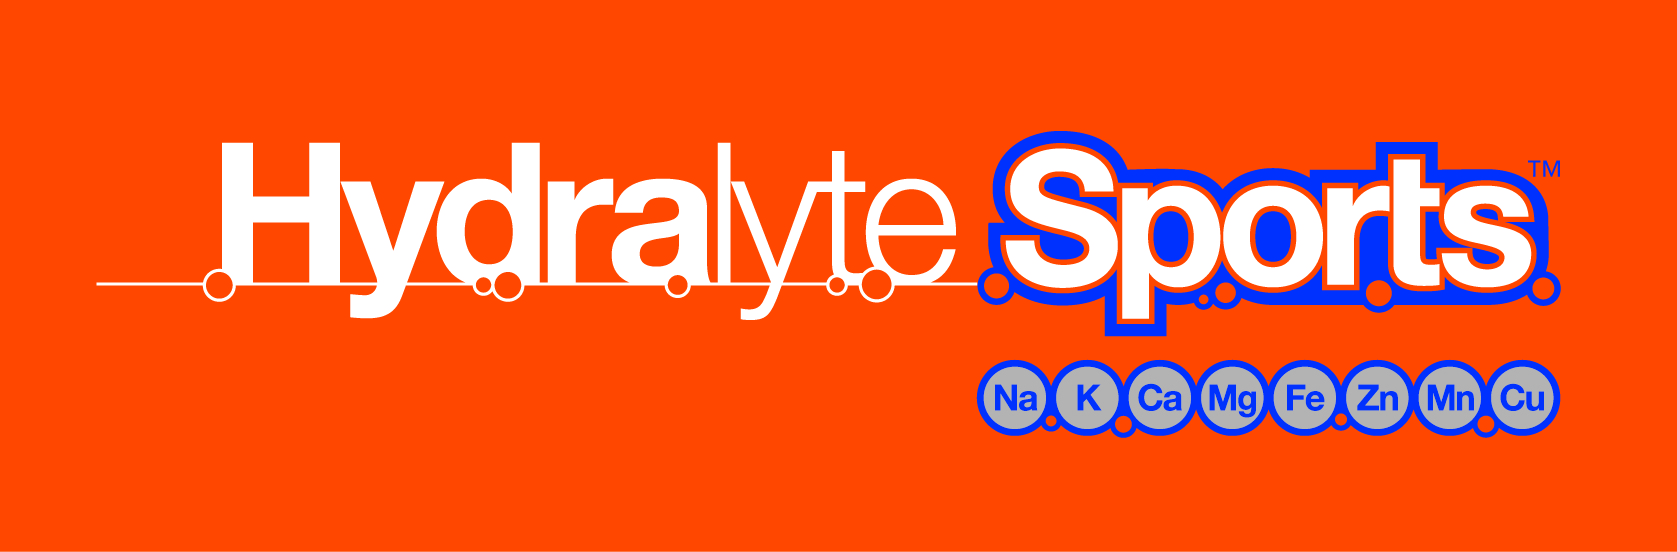 Hydralyte